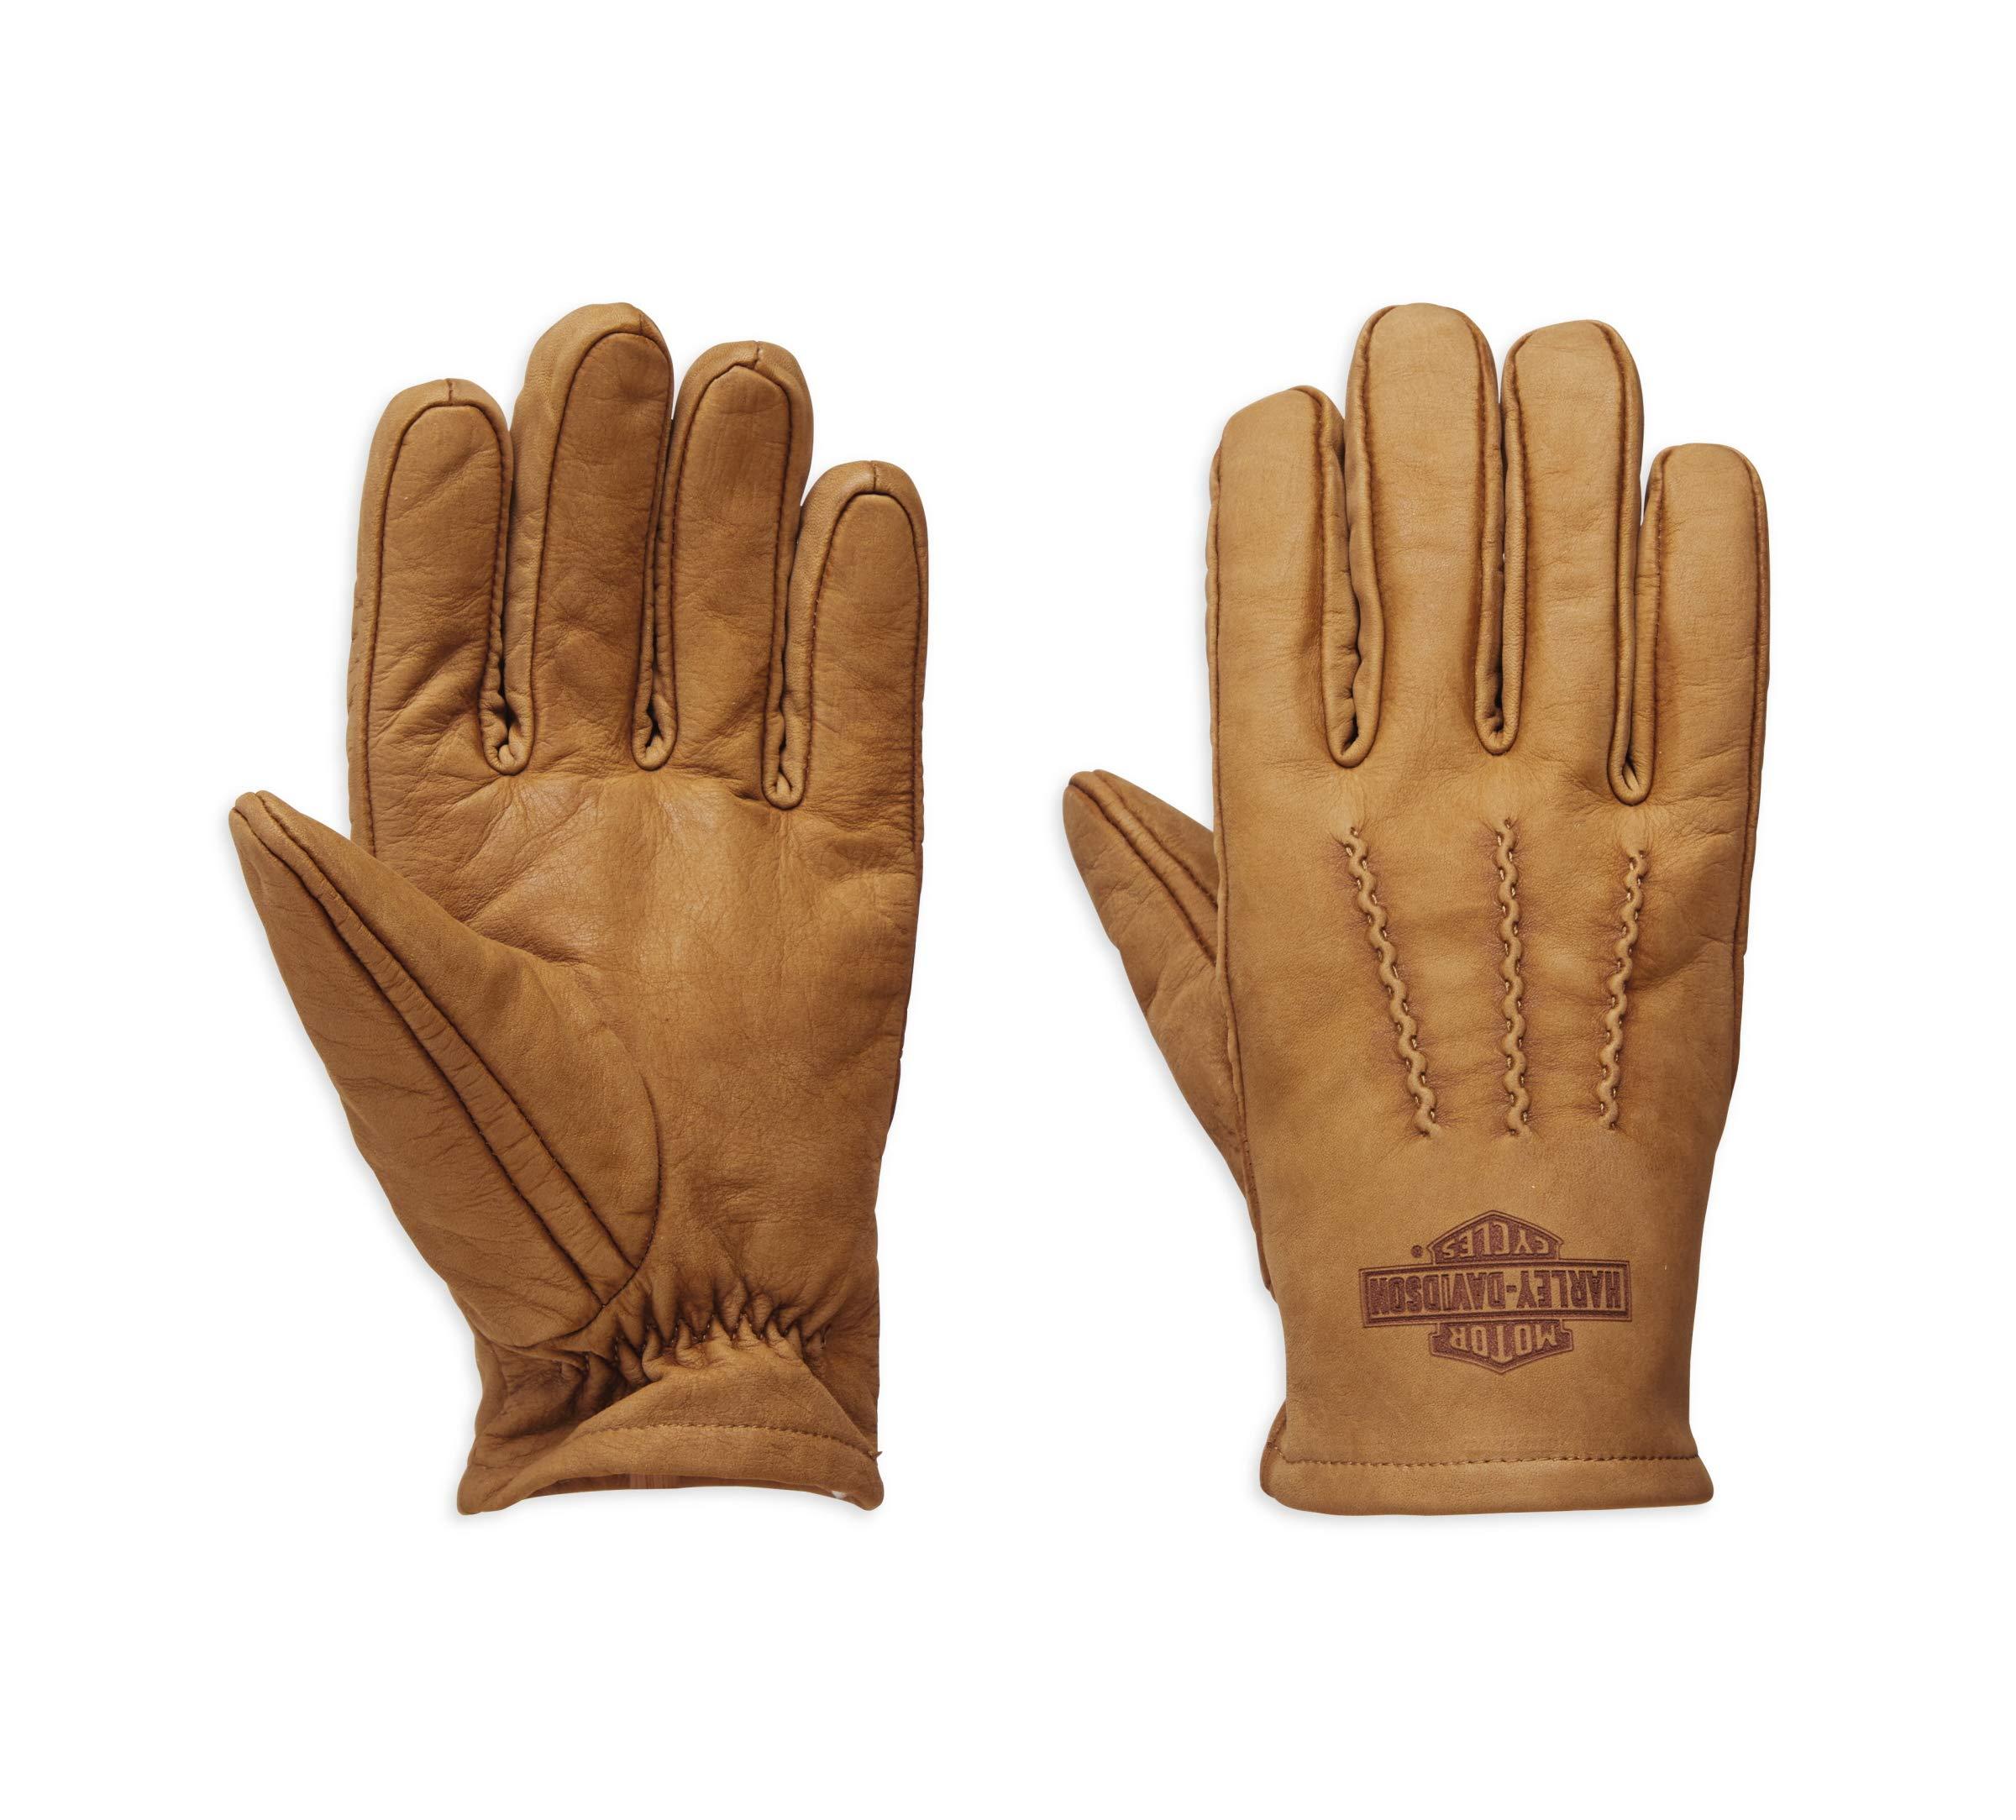 Harley-Davidson Official Men's Peshtigo Leather Gloves, Brown (Large)